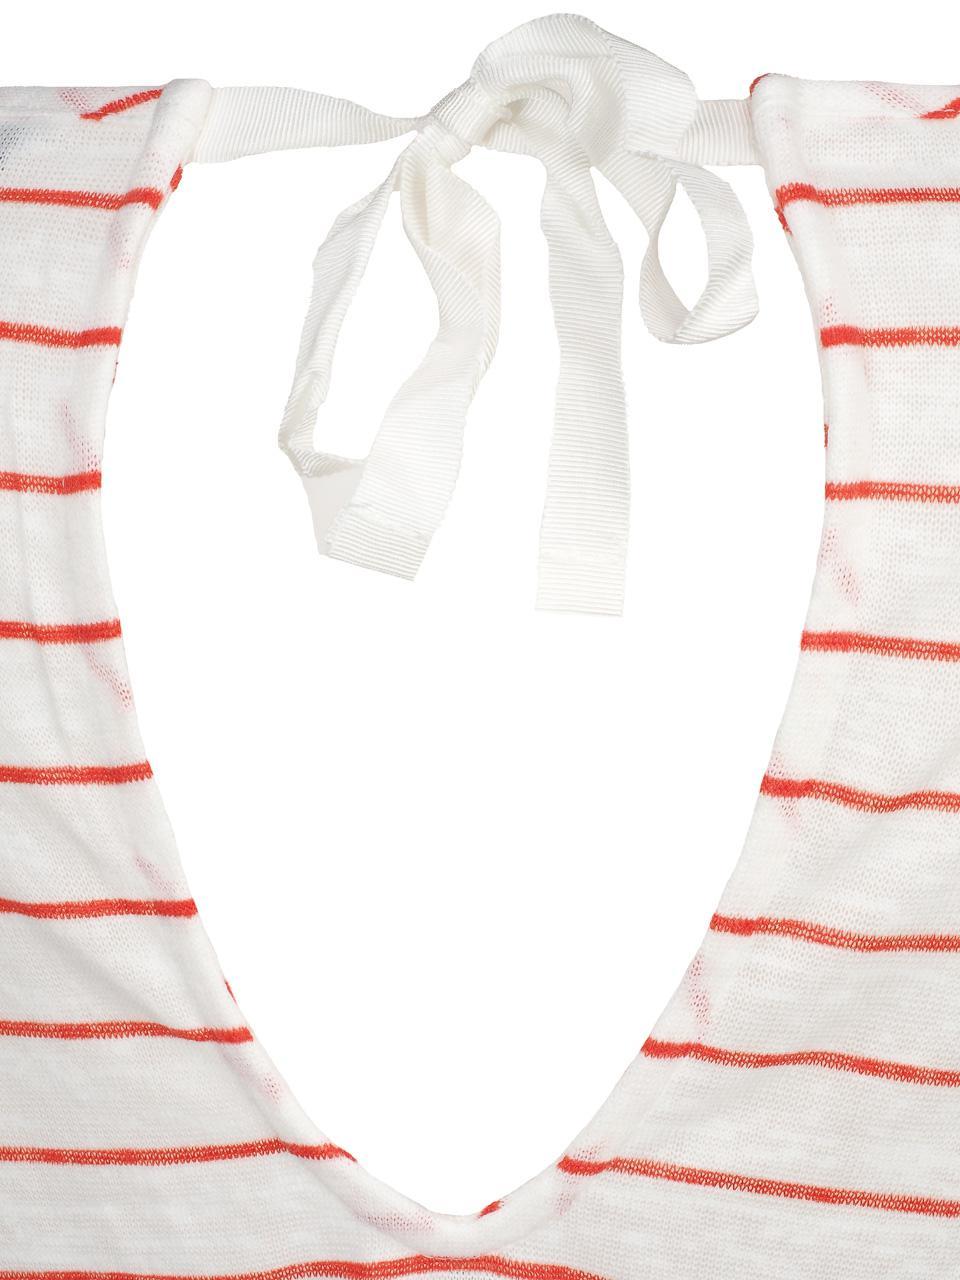 Tee-shirt-manches-longues-Only-Marina2-clouddancer-tee-l-Beige-54834-Neuf miniature 3